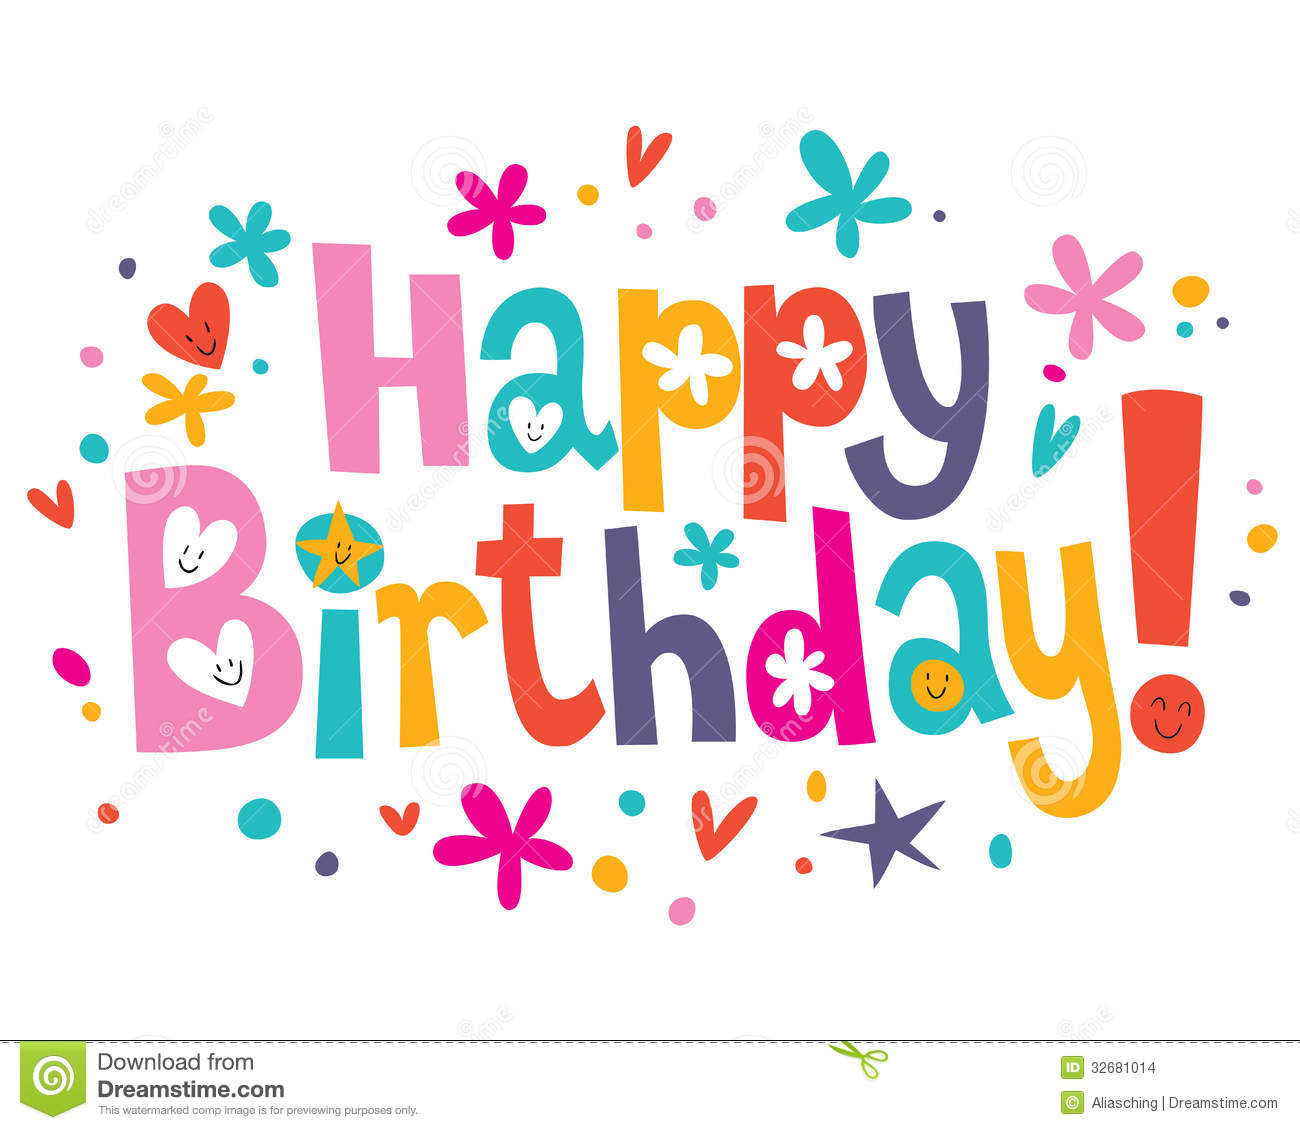 Happy Birthday Mom Quotes Wallpapers Happy Birthday Text On Erfly Happy Birthday Text Art